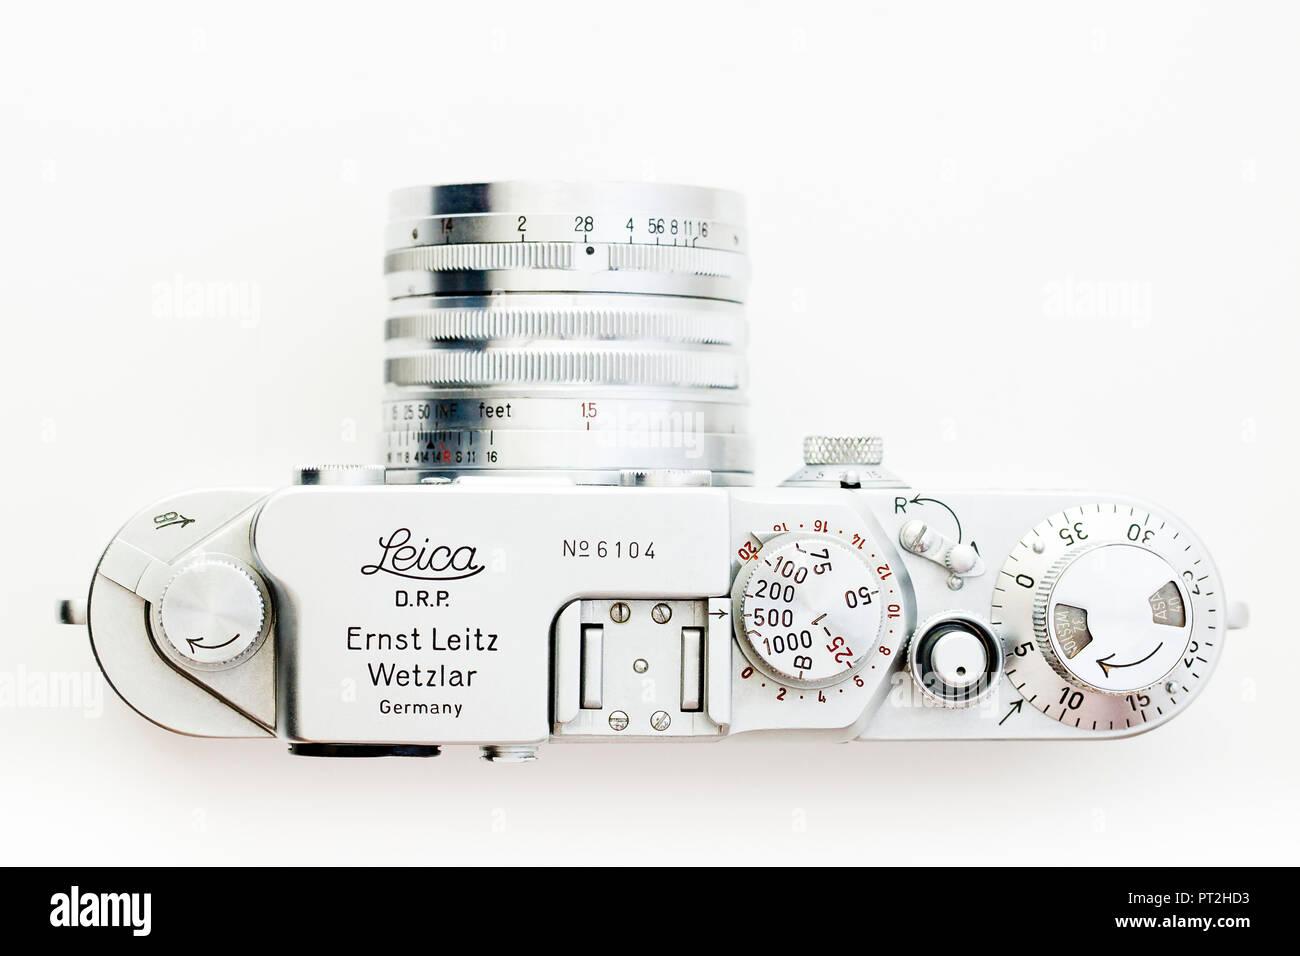 Vintage Leica IIIf 35mm film camera, circa 1952 - Stock Image